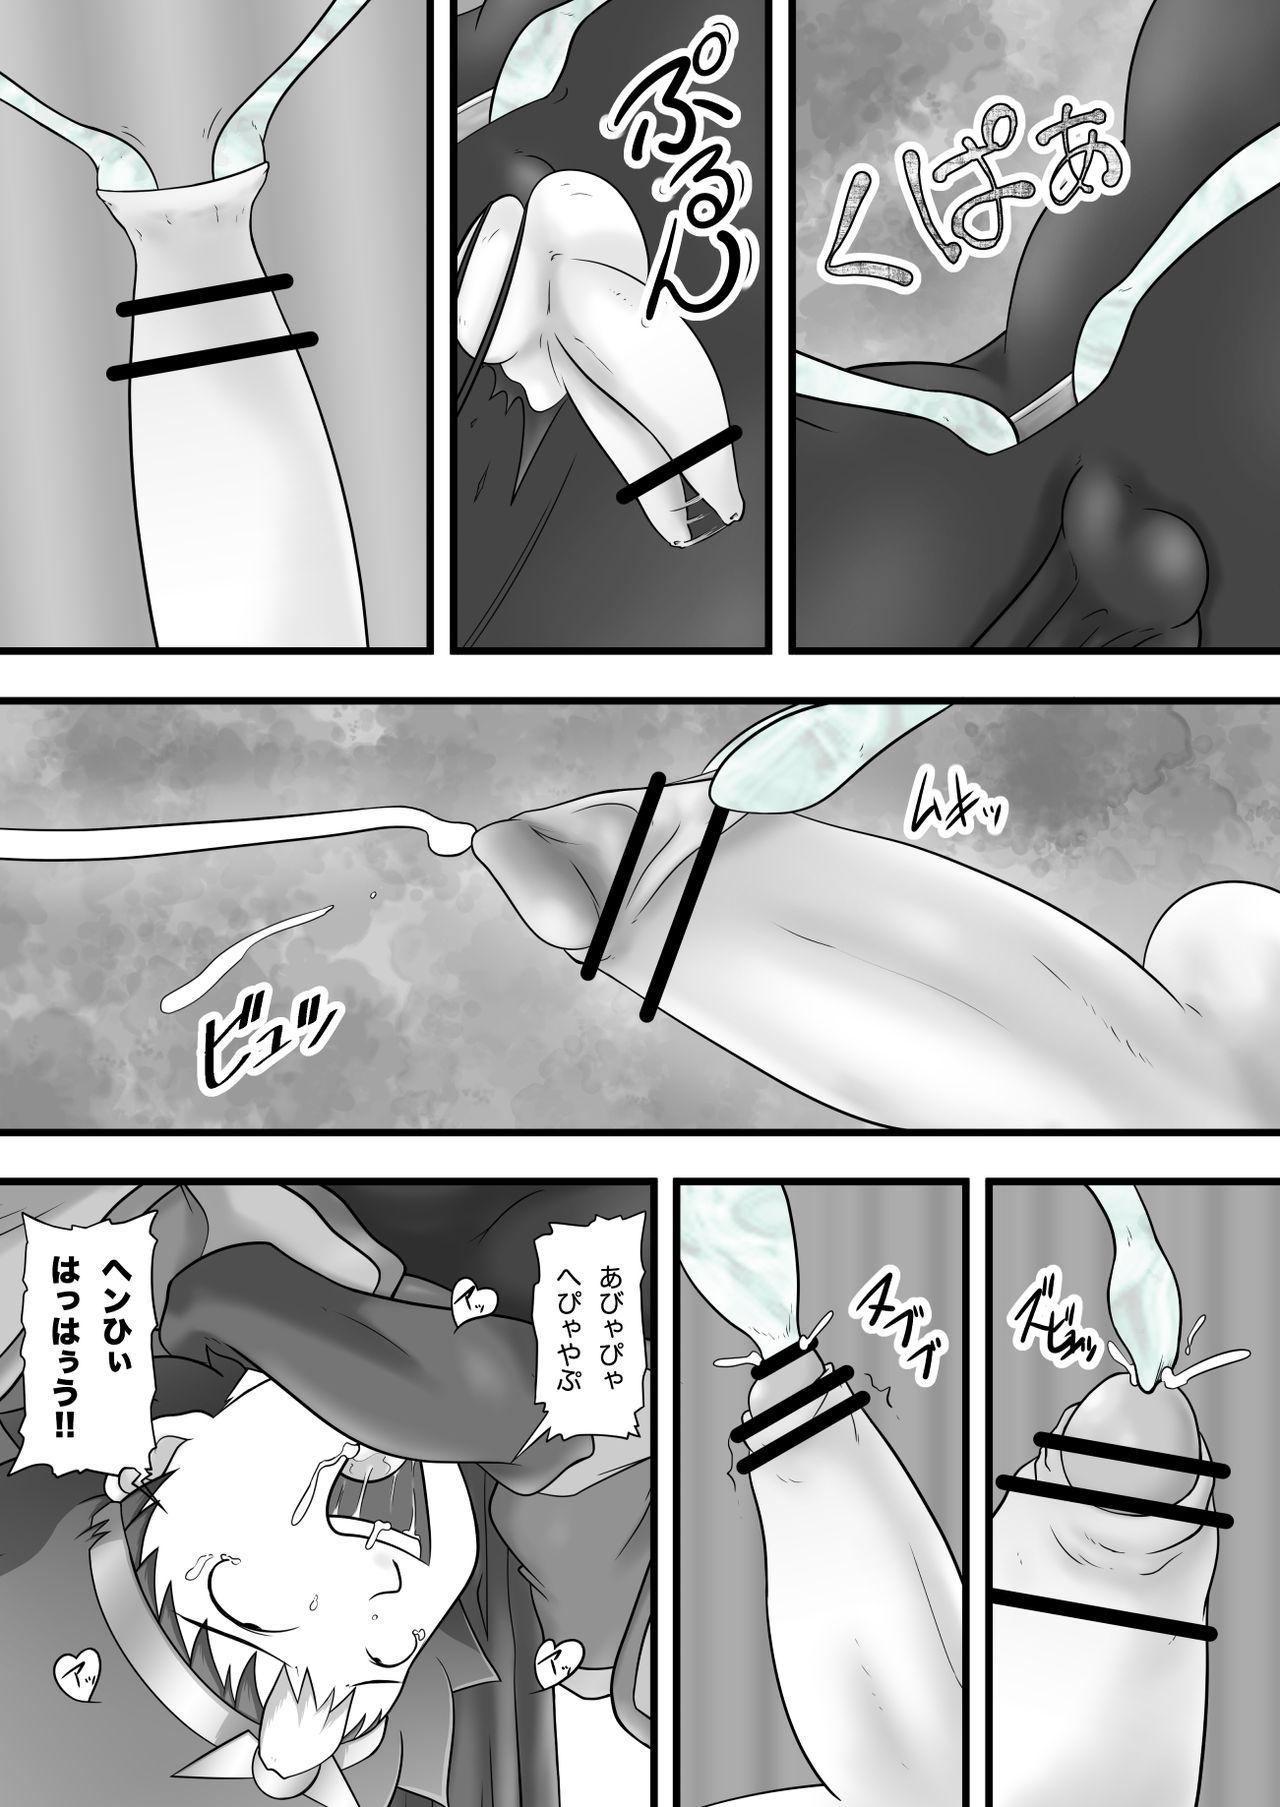 Chrono Kid TSURUGI VS Enboy 20